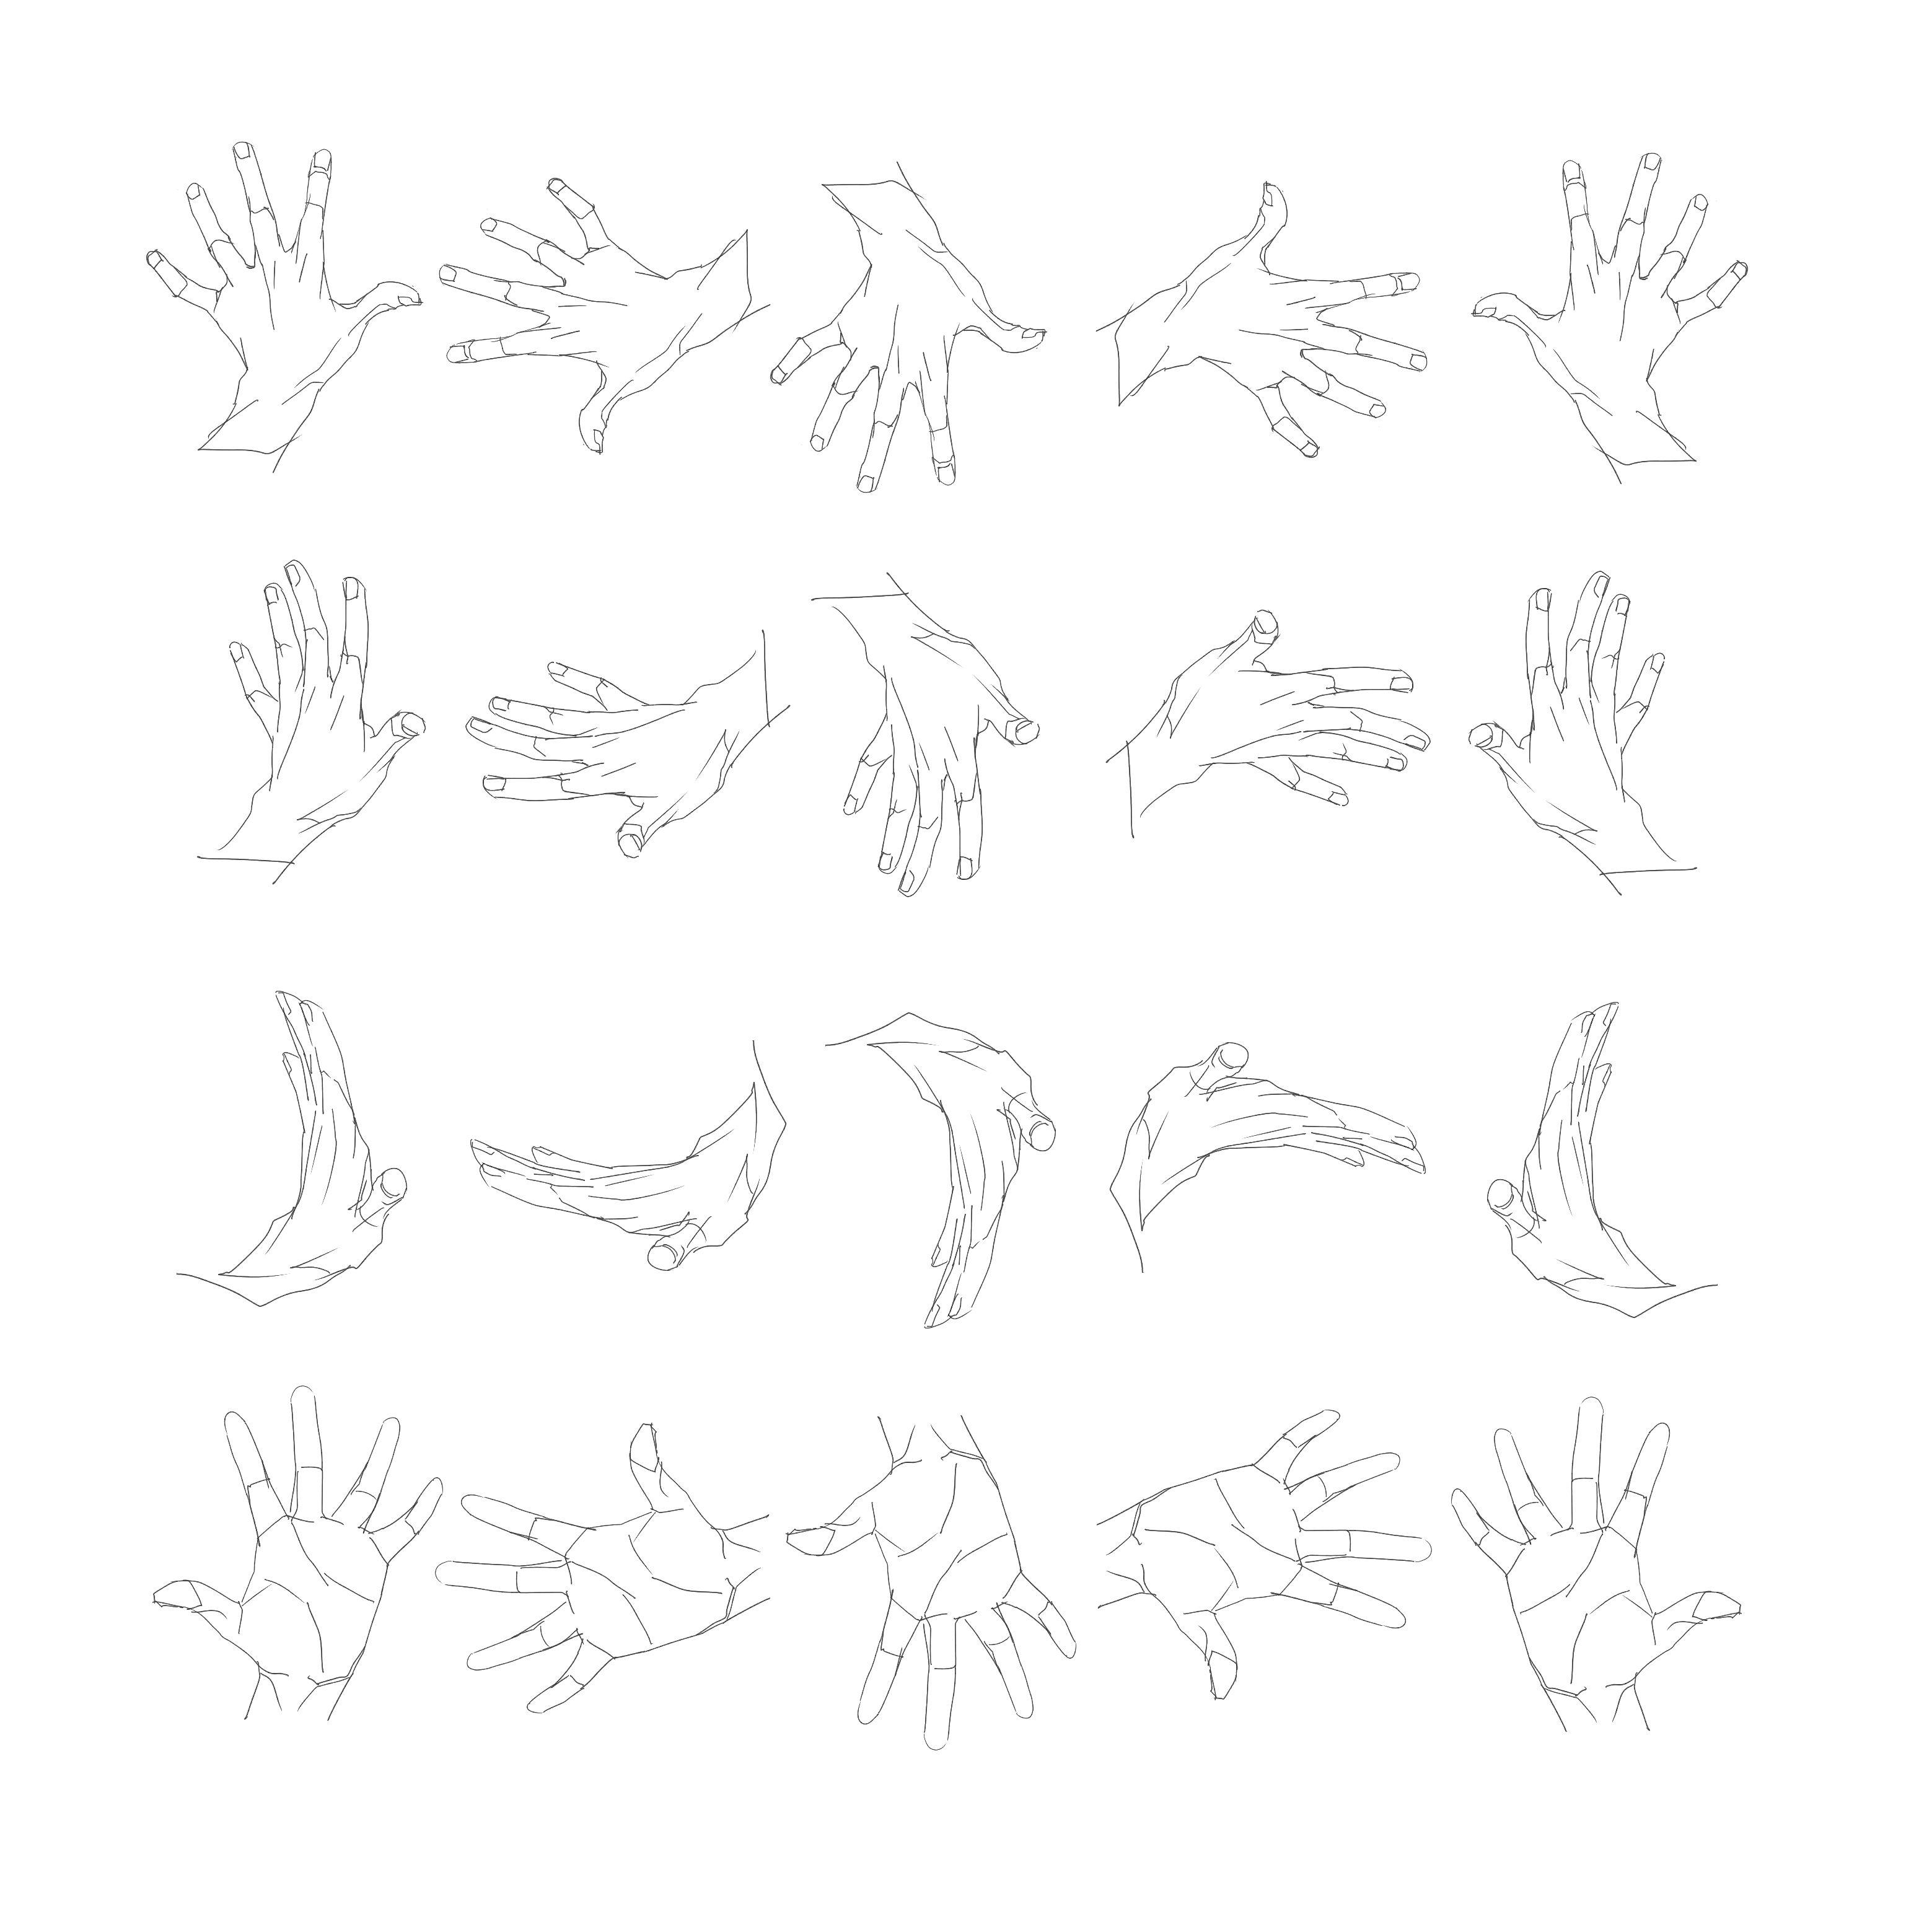 u201chands movement  rotation u201d by 0033   u2022 blog  website